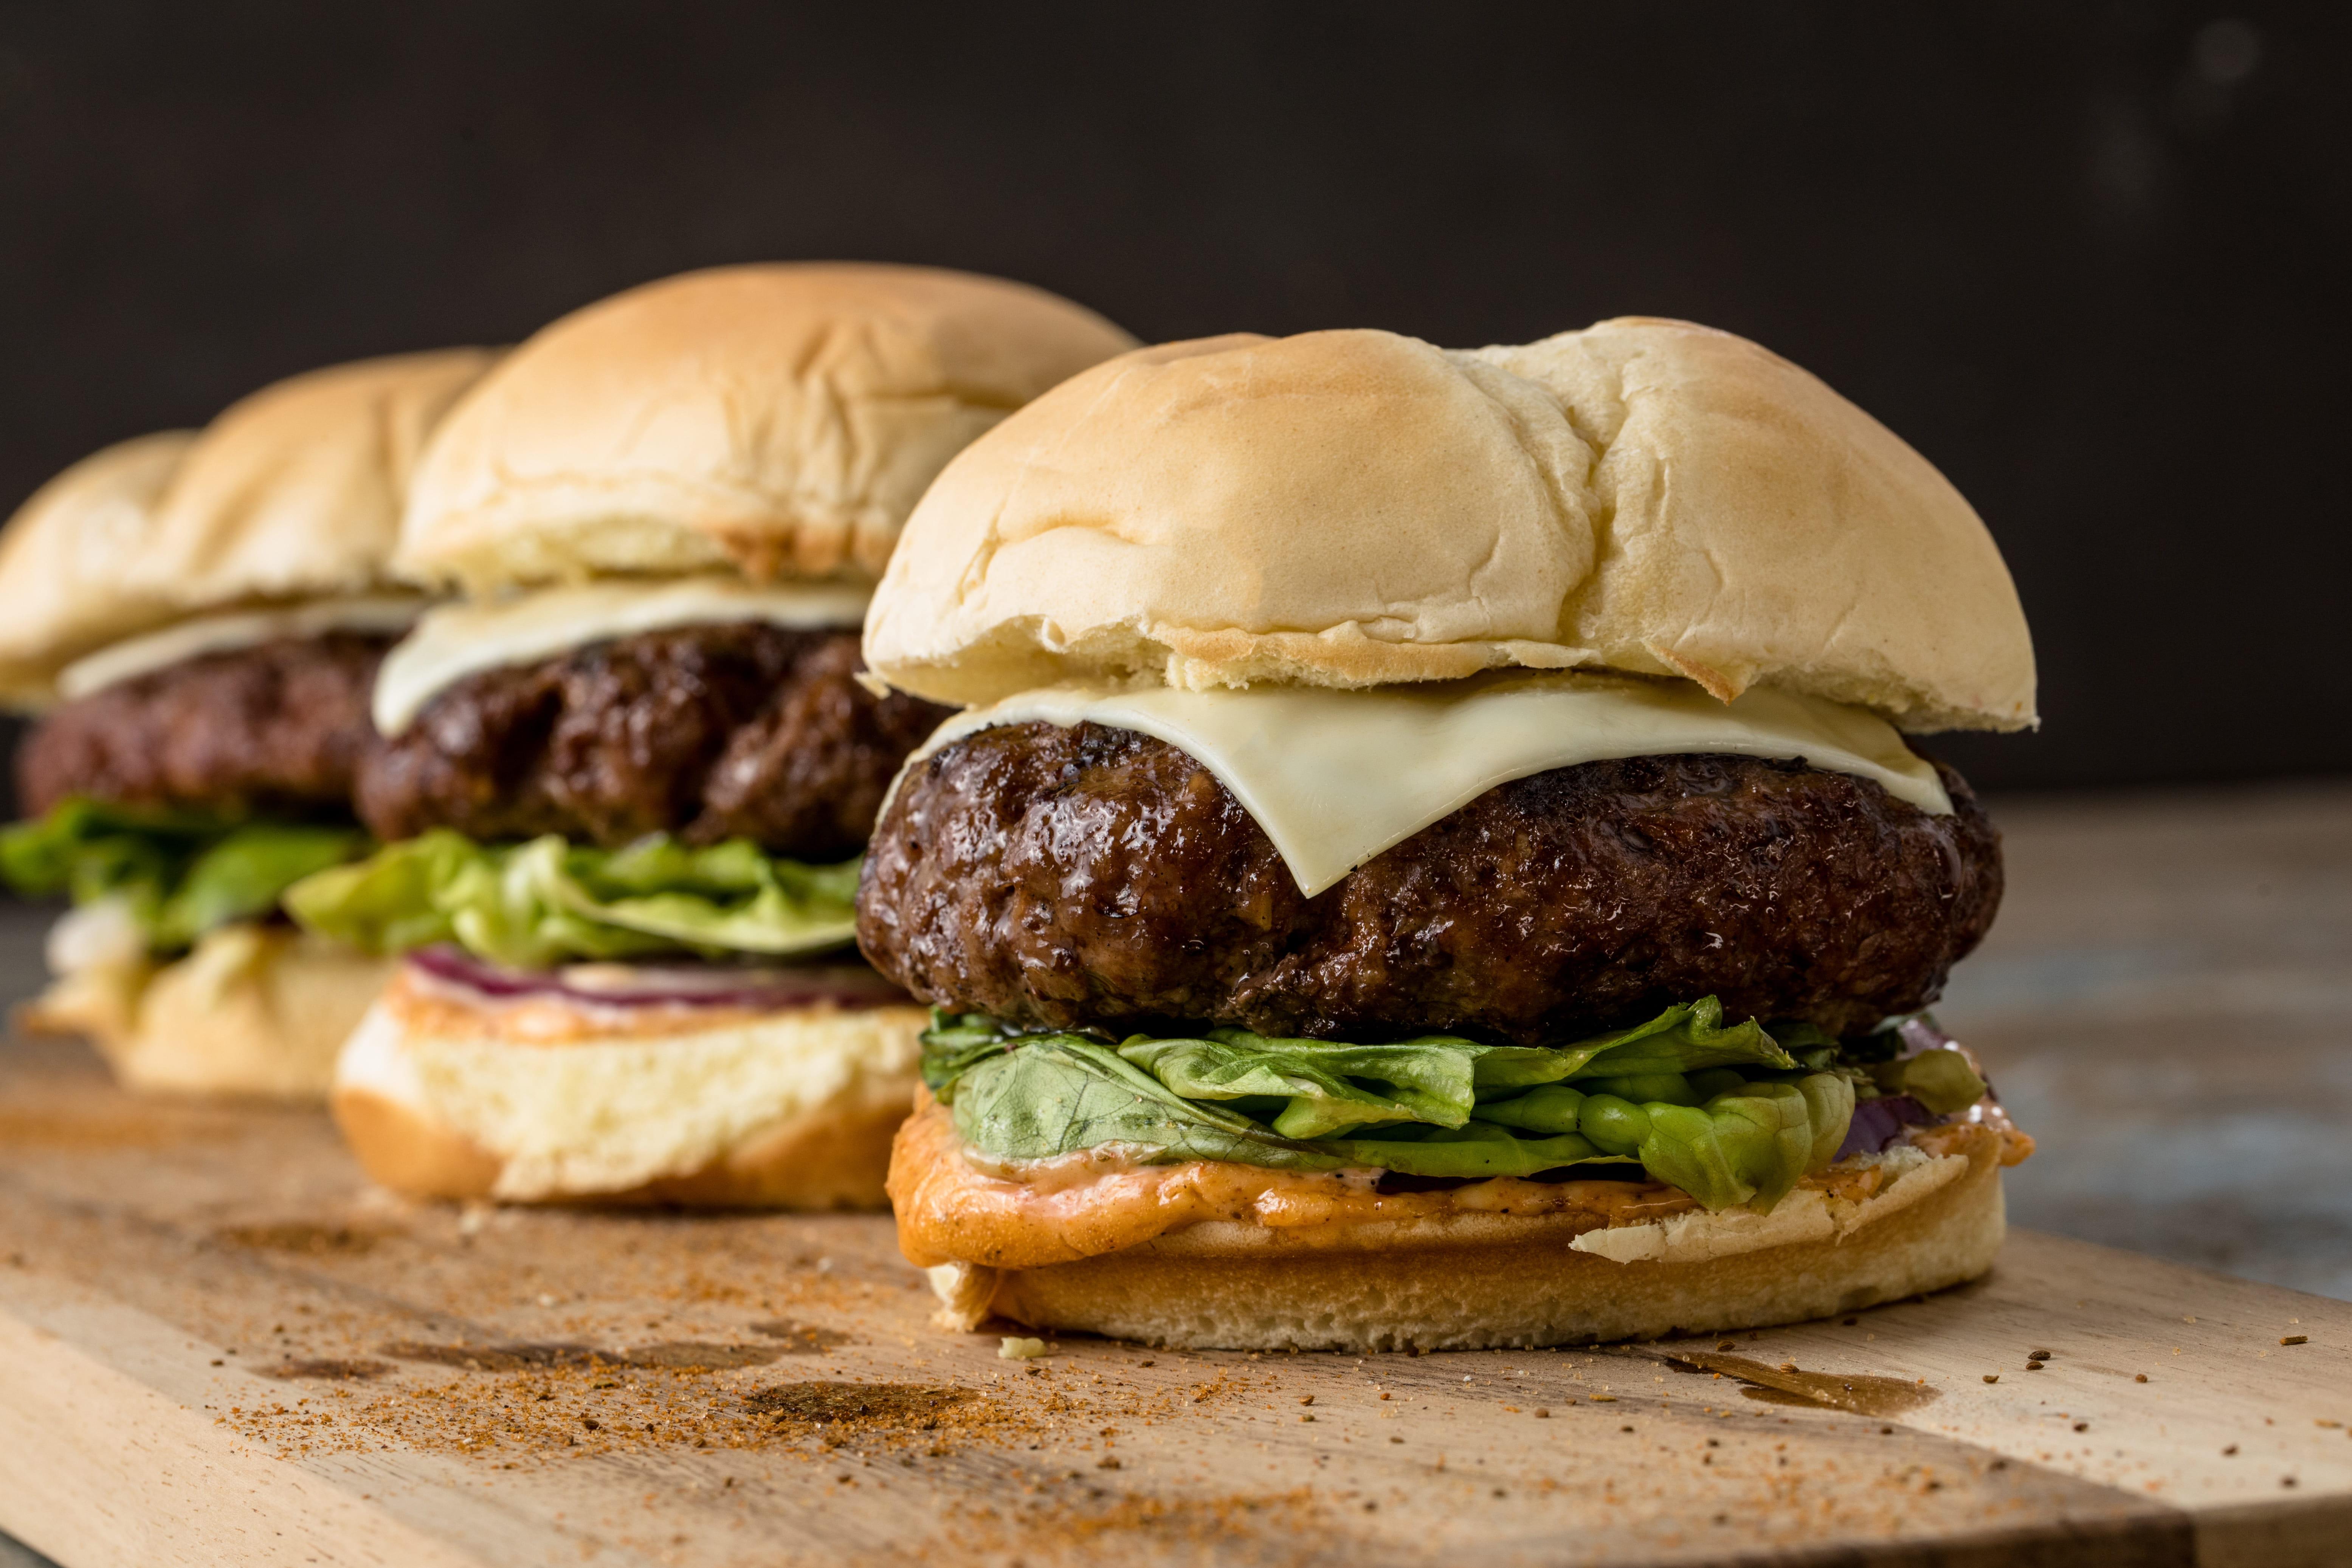 https://d1e3z2jco40k3v.cloudfront.net/-/media/foodservicefr/recettes/sandwichs-et-burger/burger-polo.jpg?rev=840ed9f5556e41a085a5ffaa62071f73&vd=20200611T222147Z&hash=26A5BF38268D7427025B2F84975B389B